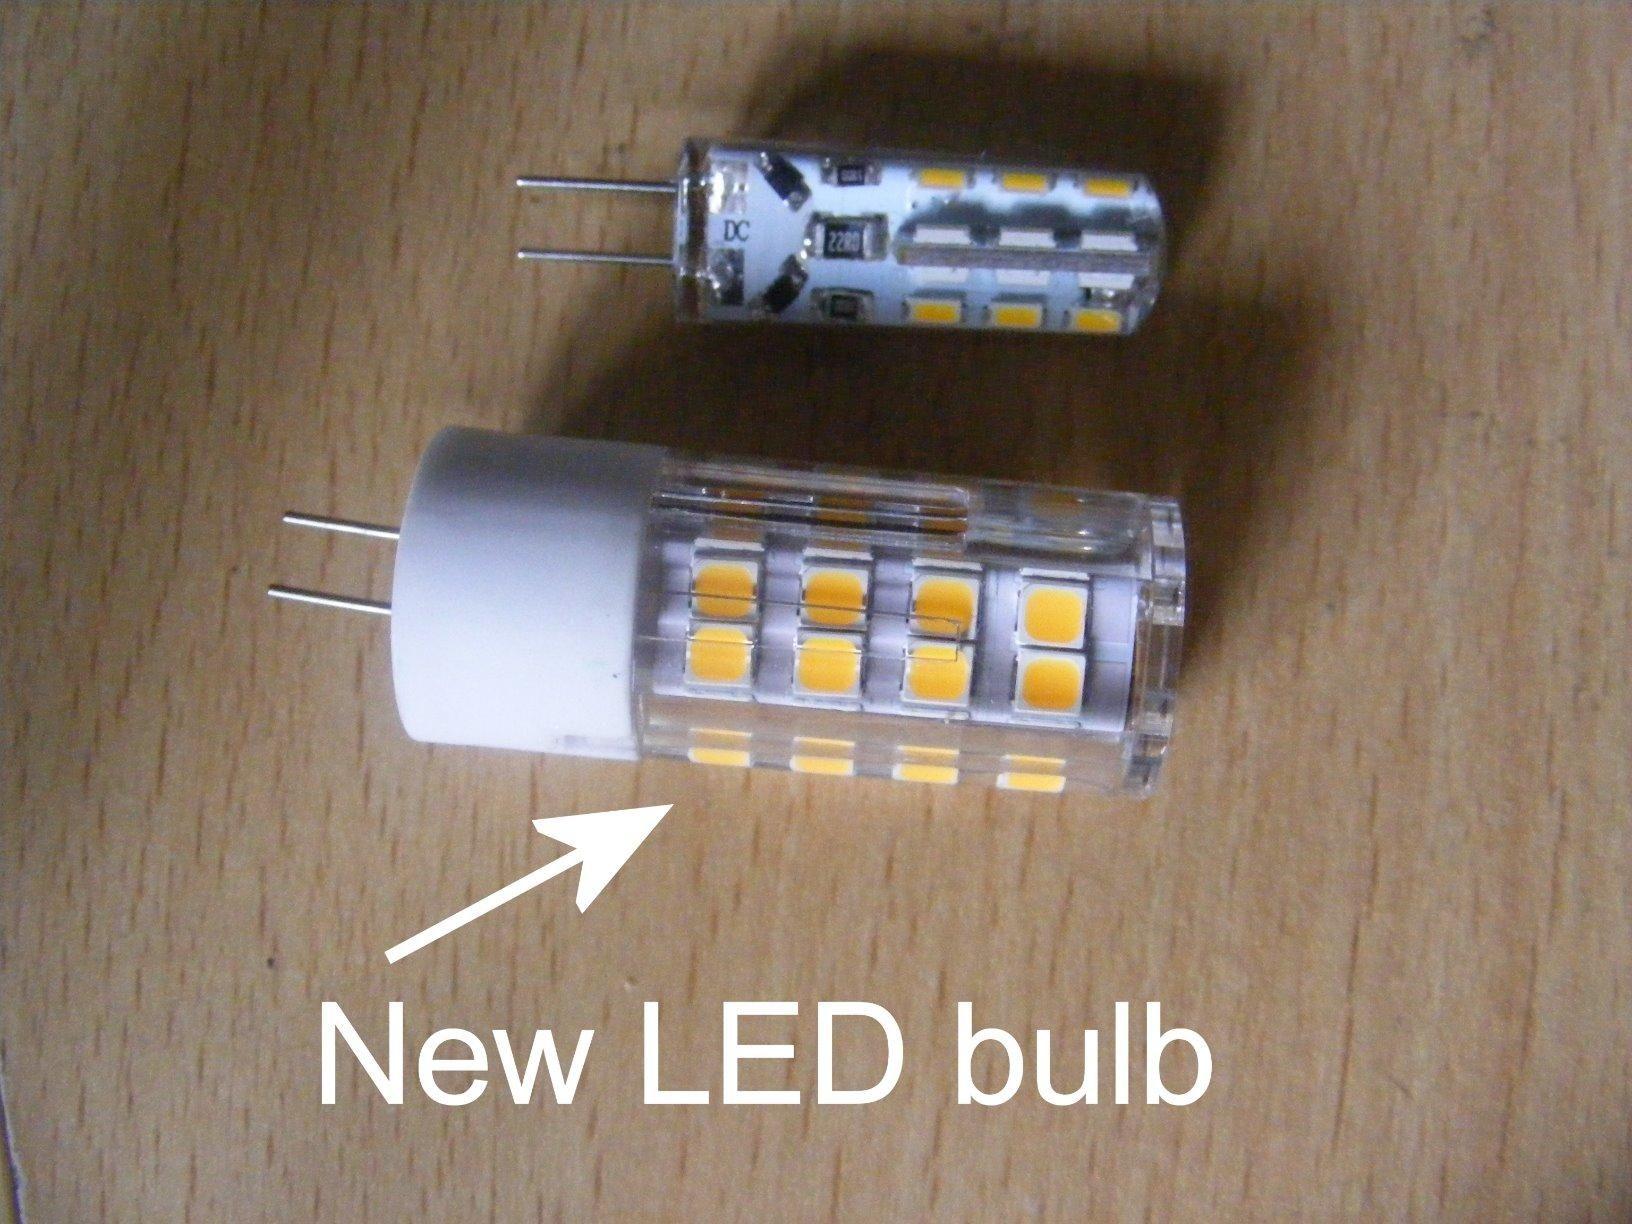 Arvidsson G4 Led Bulb 4w 40w Halogen Spotlight Equivalent 3000k Warm White Romantic Glow Ceramic Heat Sink 12v Dc Energy Saving Bulbs Led Bulb Save Energy